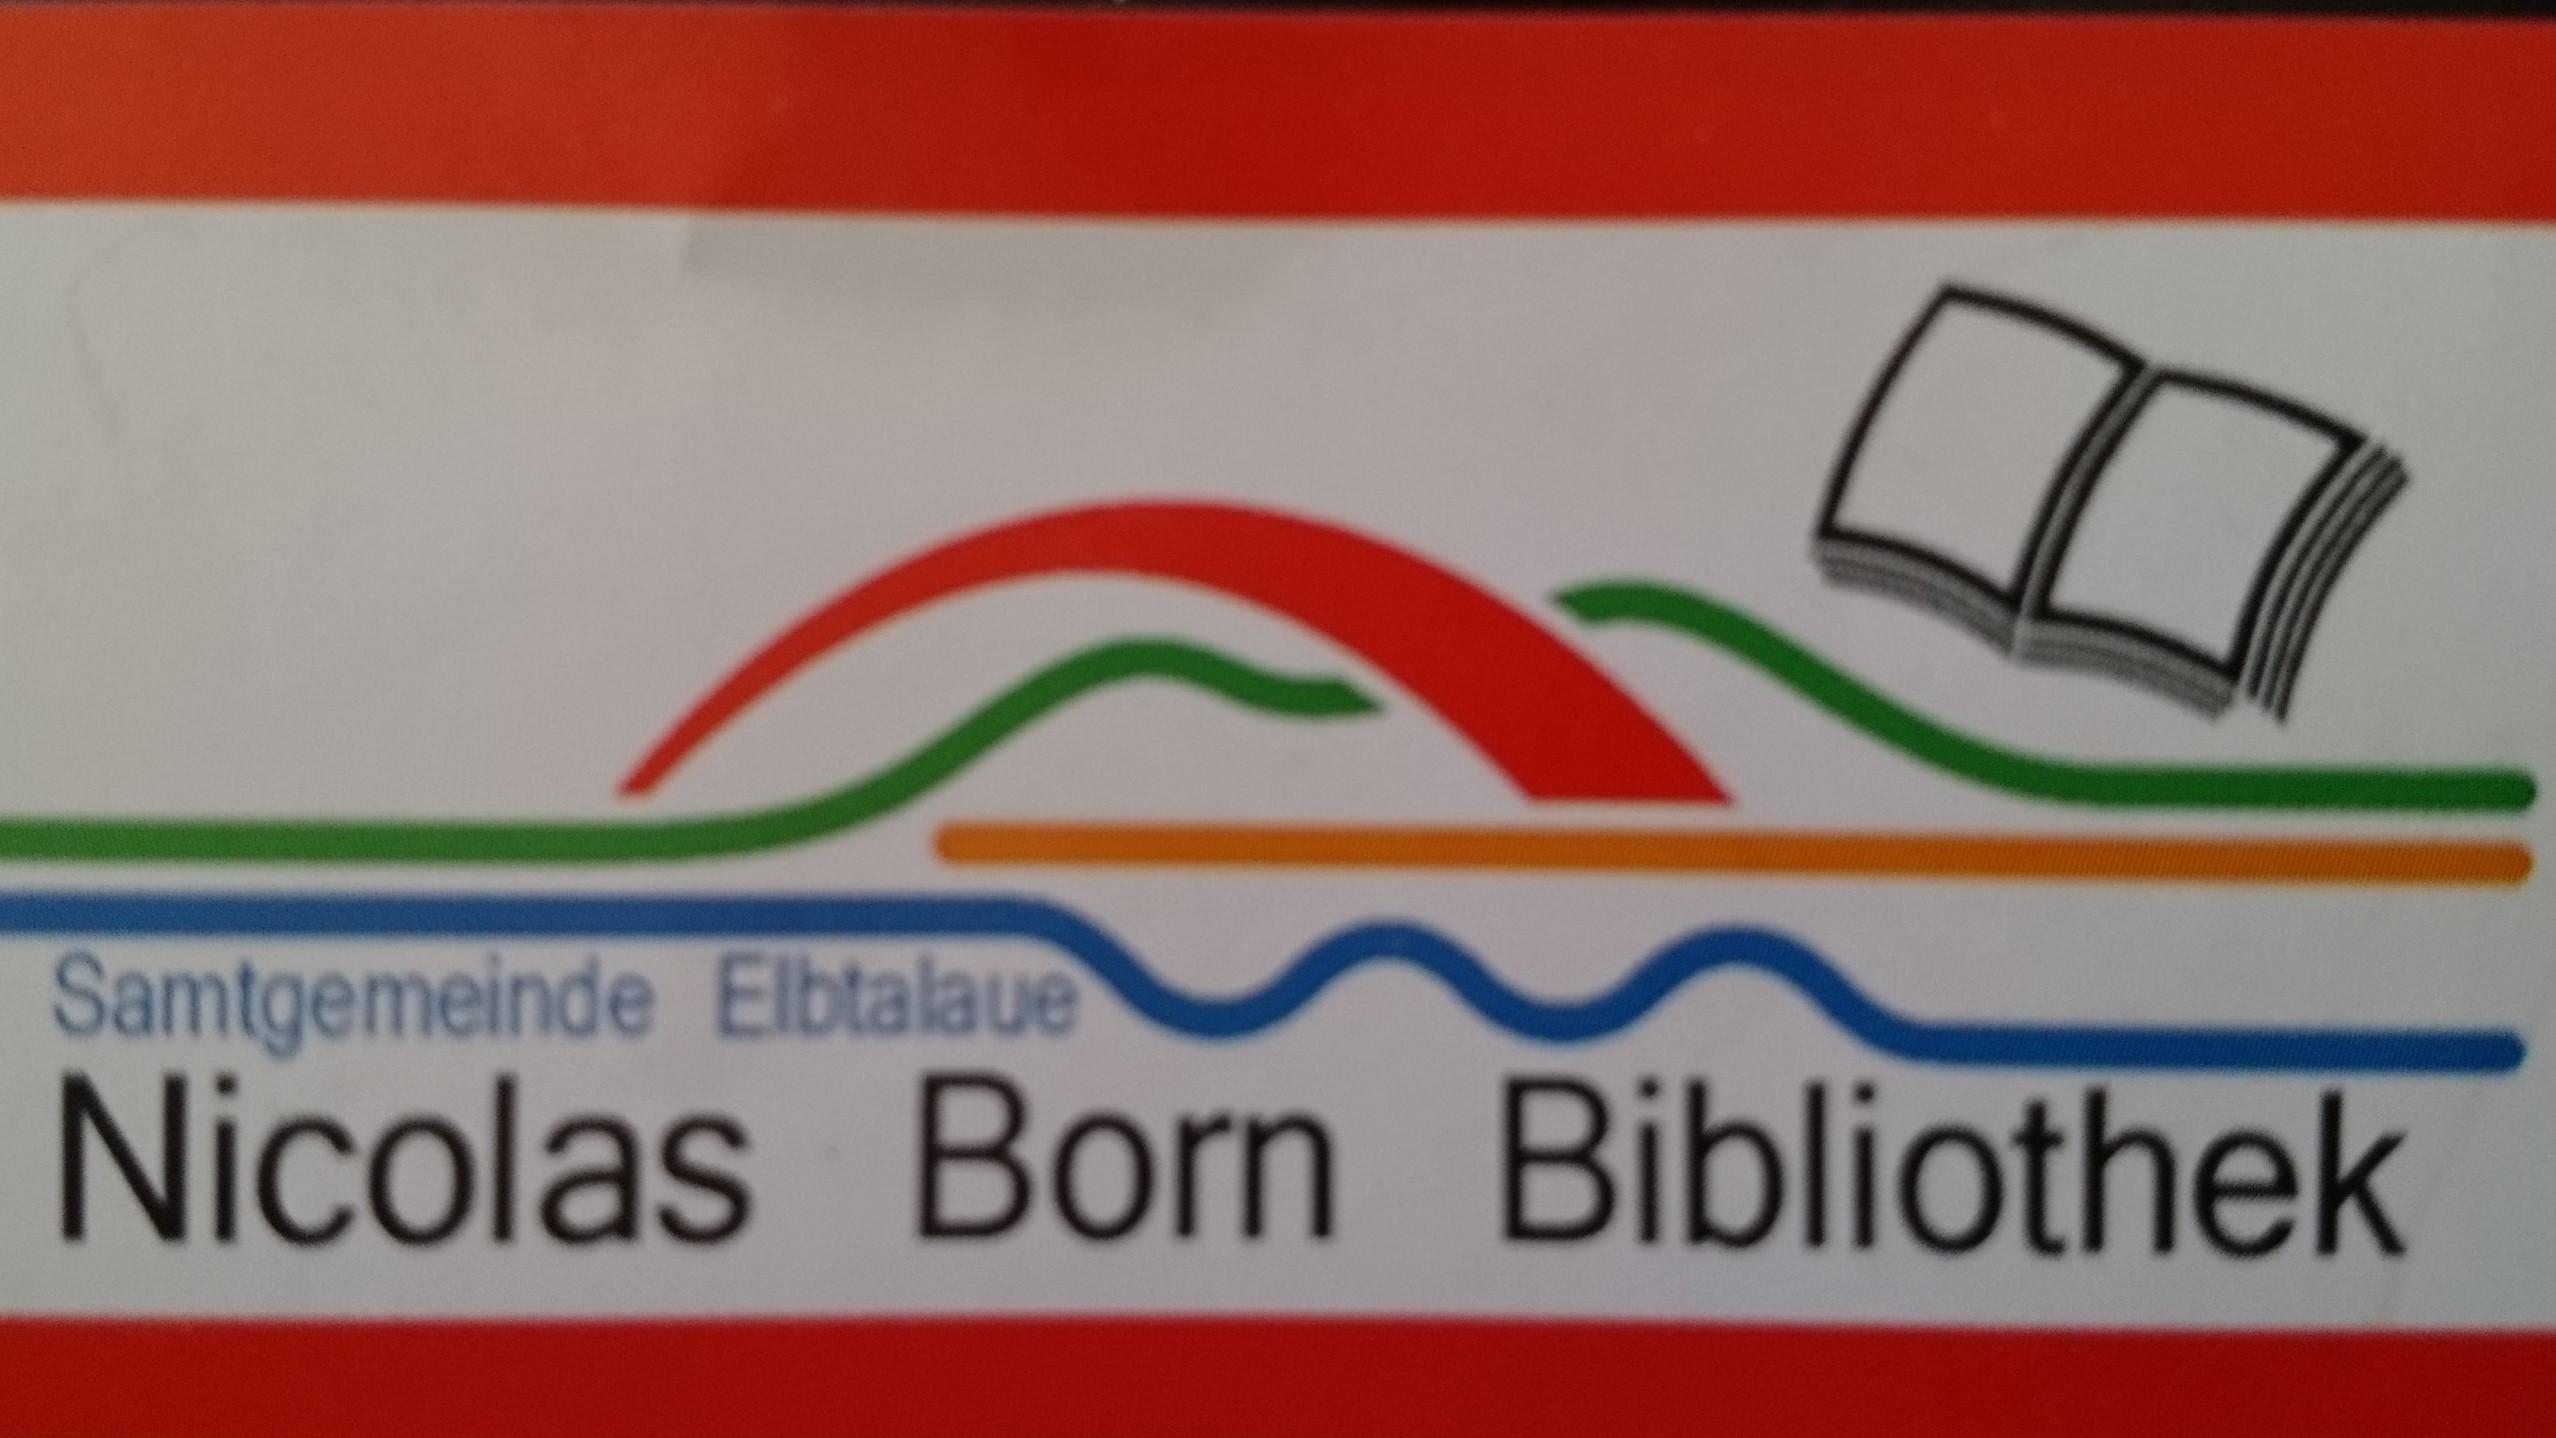 Bücherei Nicolas-Born-Bibliothek Dannenberg (Elbe)